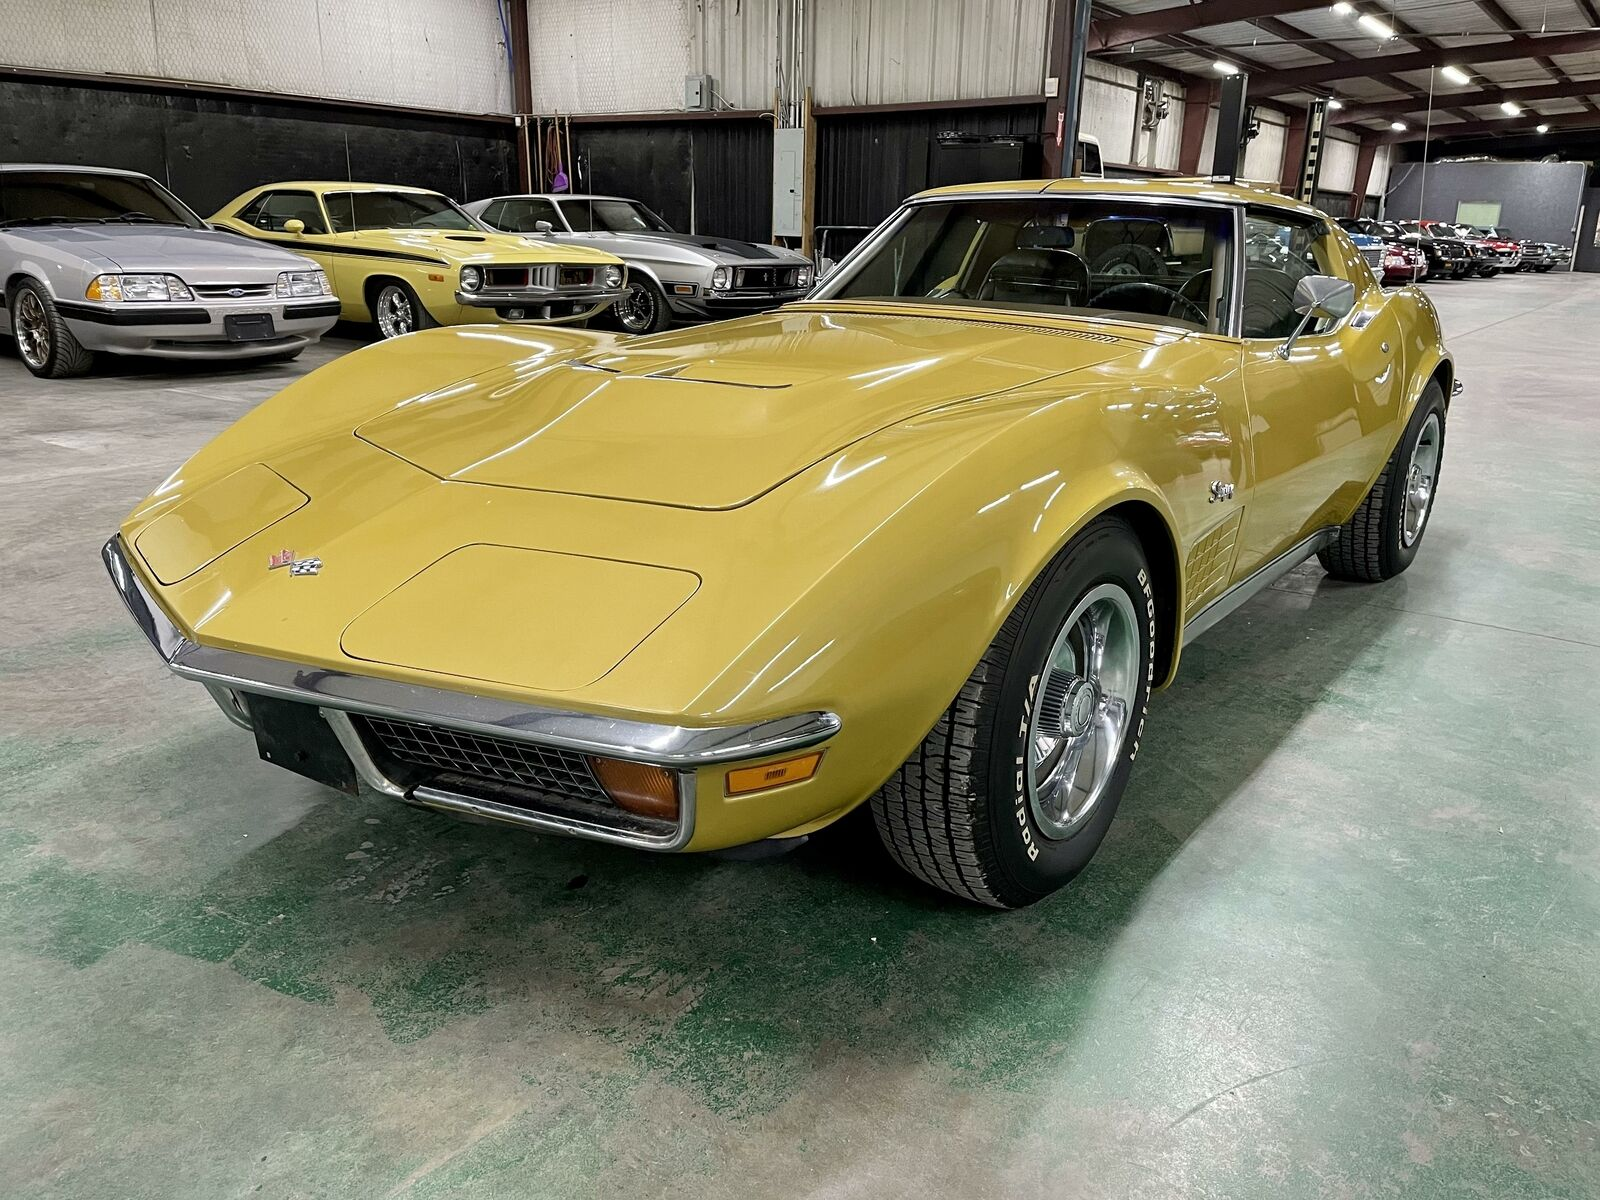 1972 Yellow Chevrolet Corvette   | C3 Corvette Photo 1